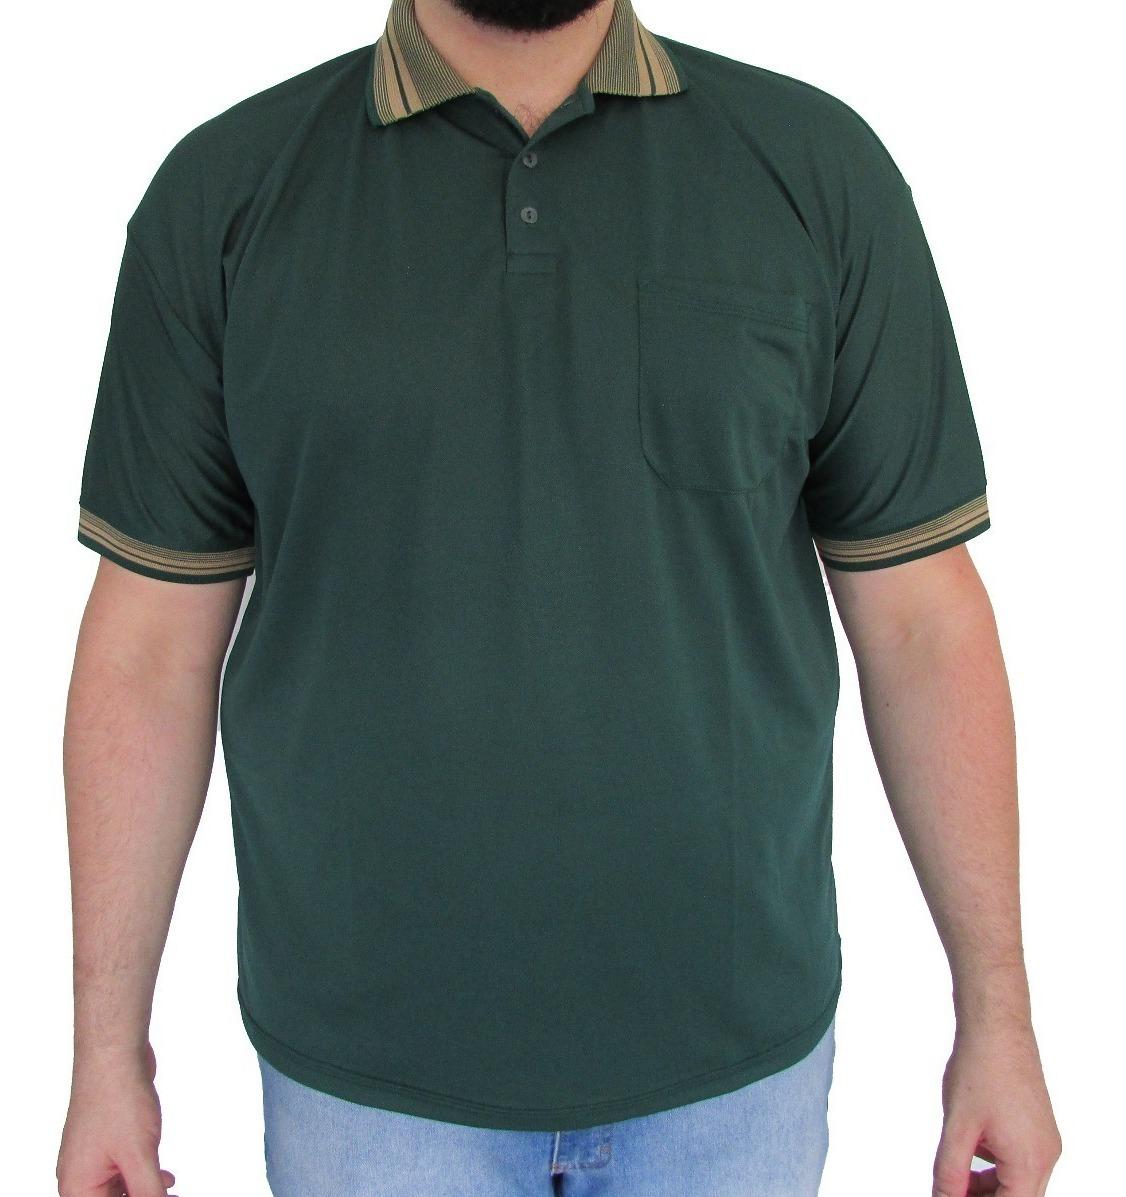 833b745db2 Kit 10 Camisas Gola Polo Dry Fit Detalhes Tamanho Grande - R$ 589,00 ...